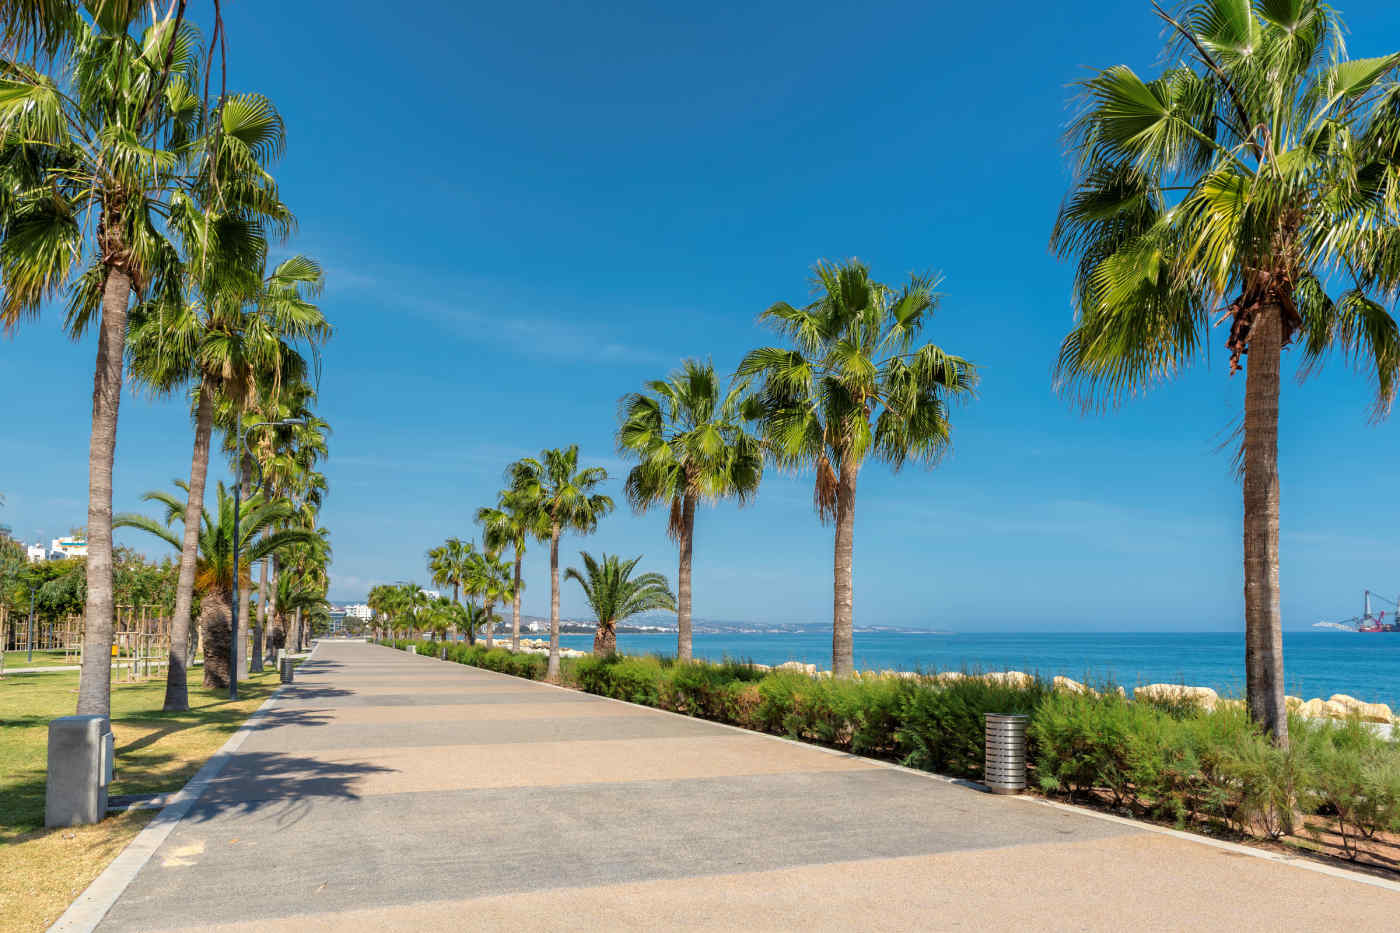 Promenade • Limassol, Cyprus